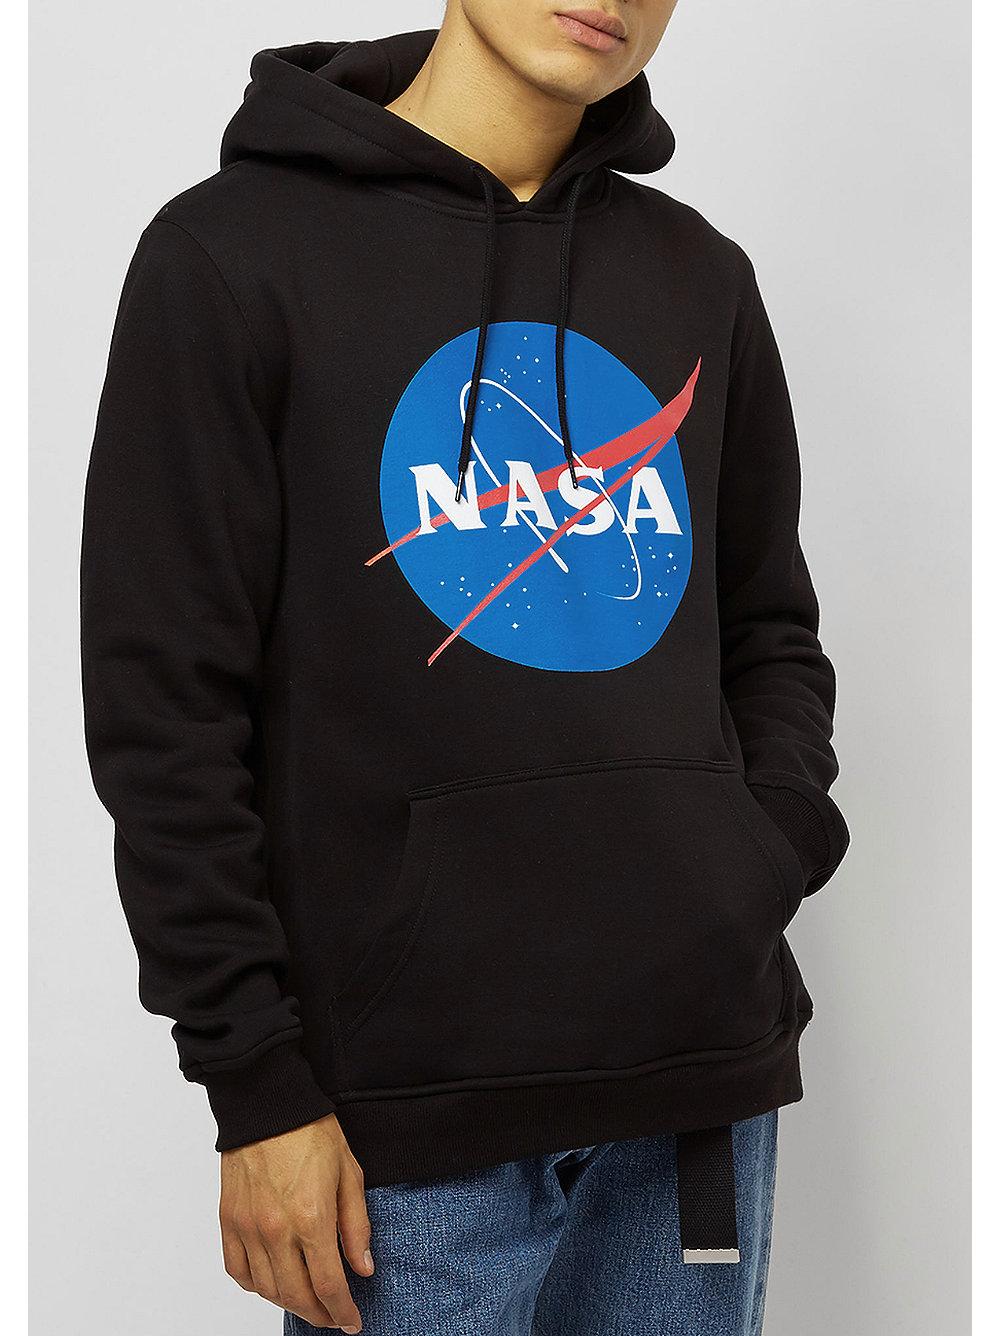 Nasa online shop